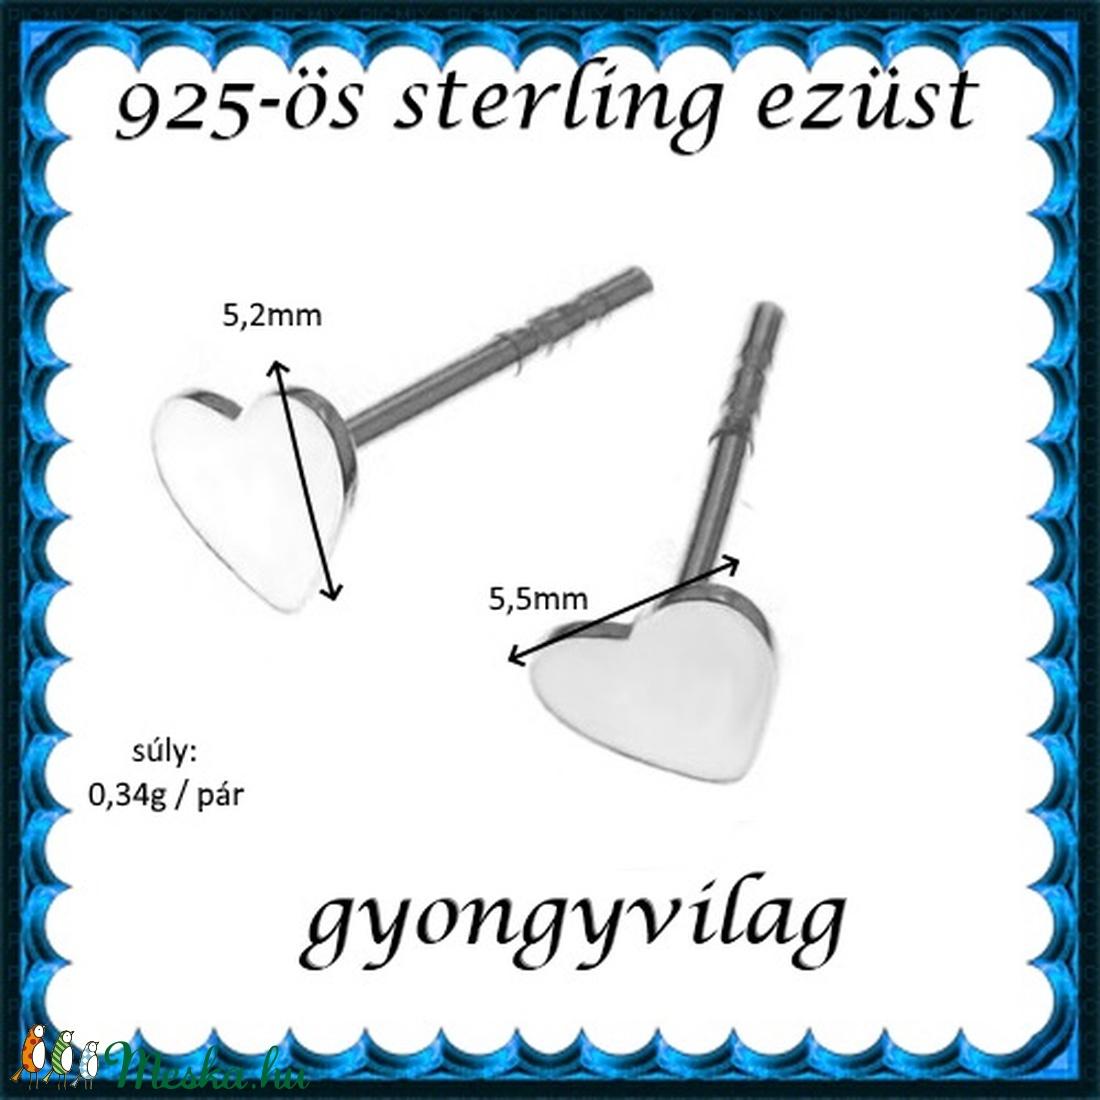 925-ös sterling ezüst: fülbevaló  EF 12 - ékszer - fülbevaló - pötty fülbevaló - Meska.hu